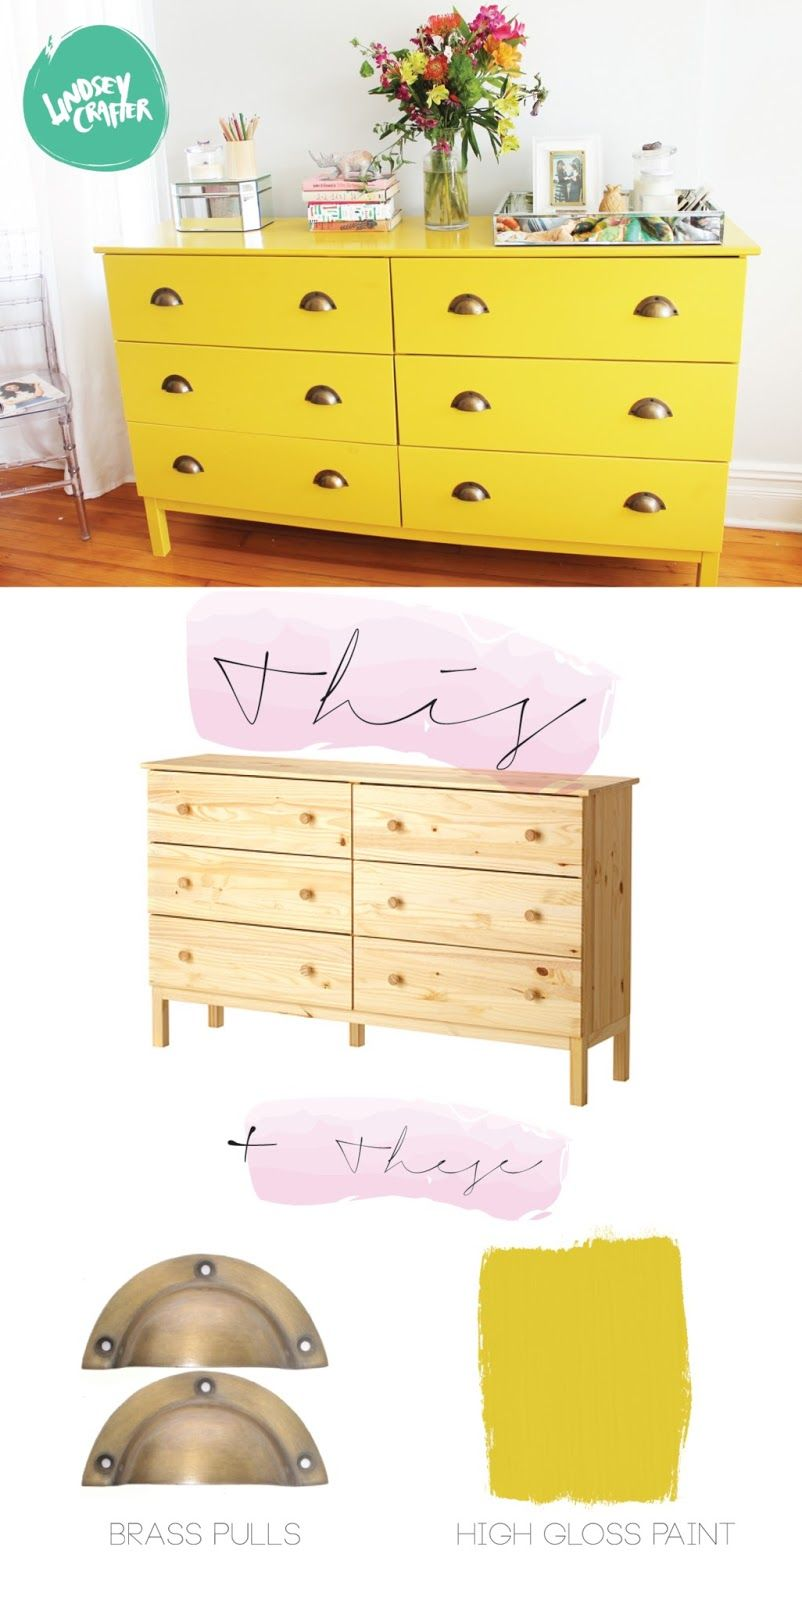 LINDSEY CRAFTER Ikea Hacks Luxe Laquer Dresser